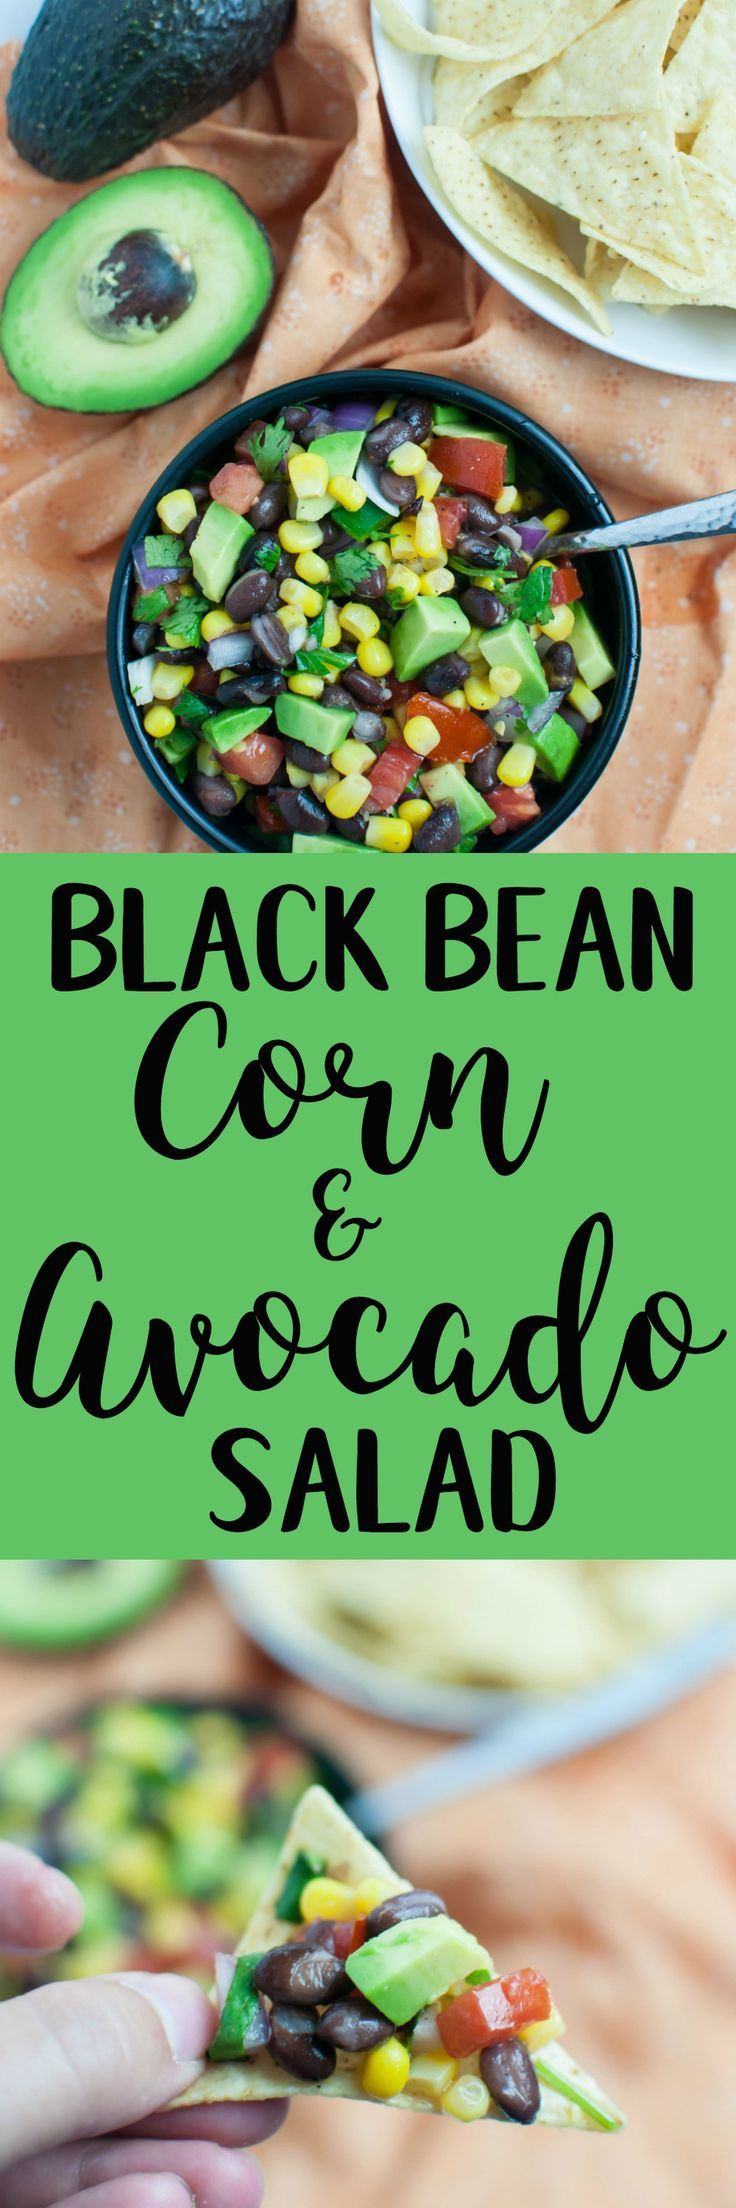 Black Bean, Corn & Avocado Salad